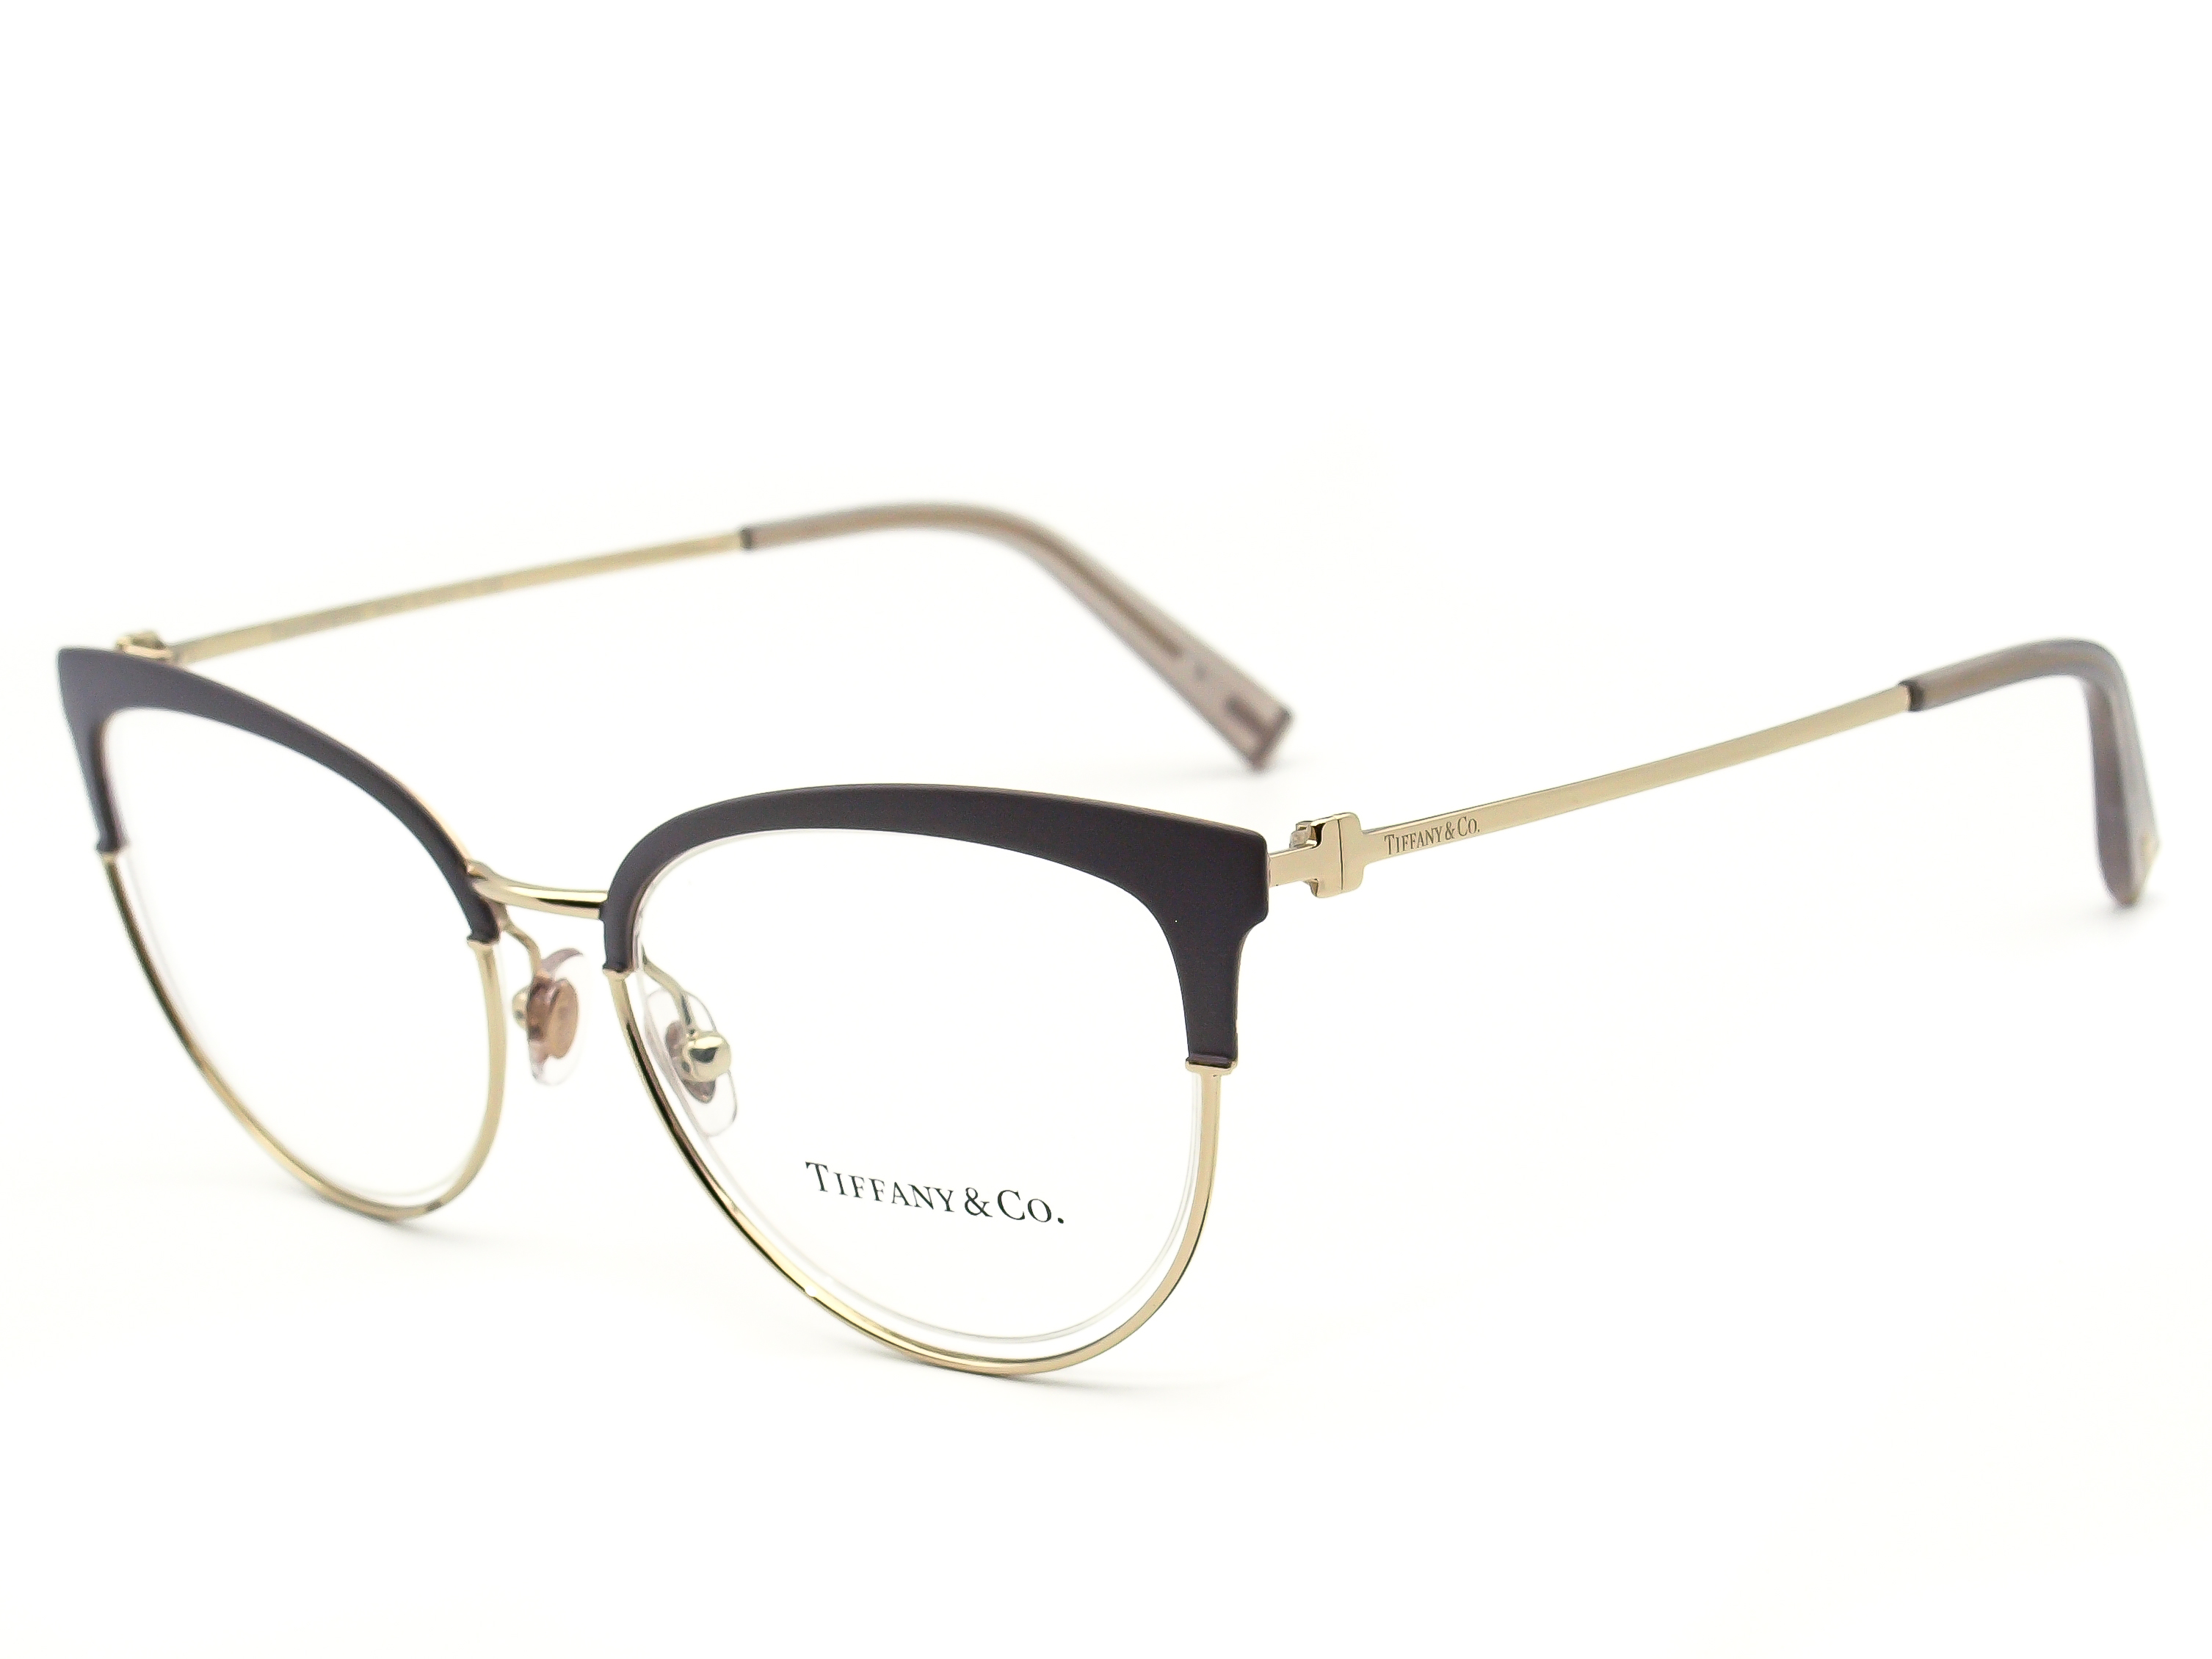 Tiffany Co Tf 1132 6133 Eyeglasses By64 4178